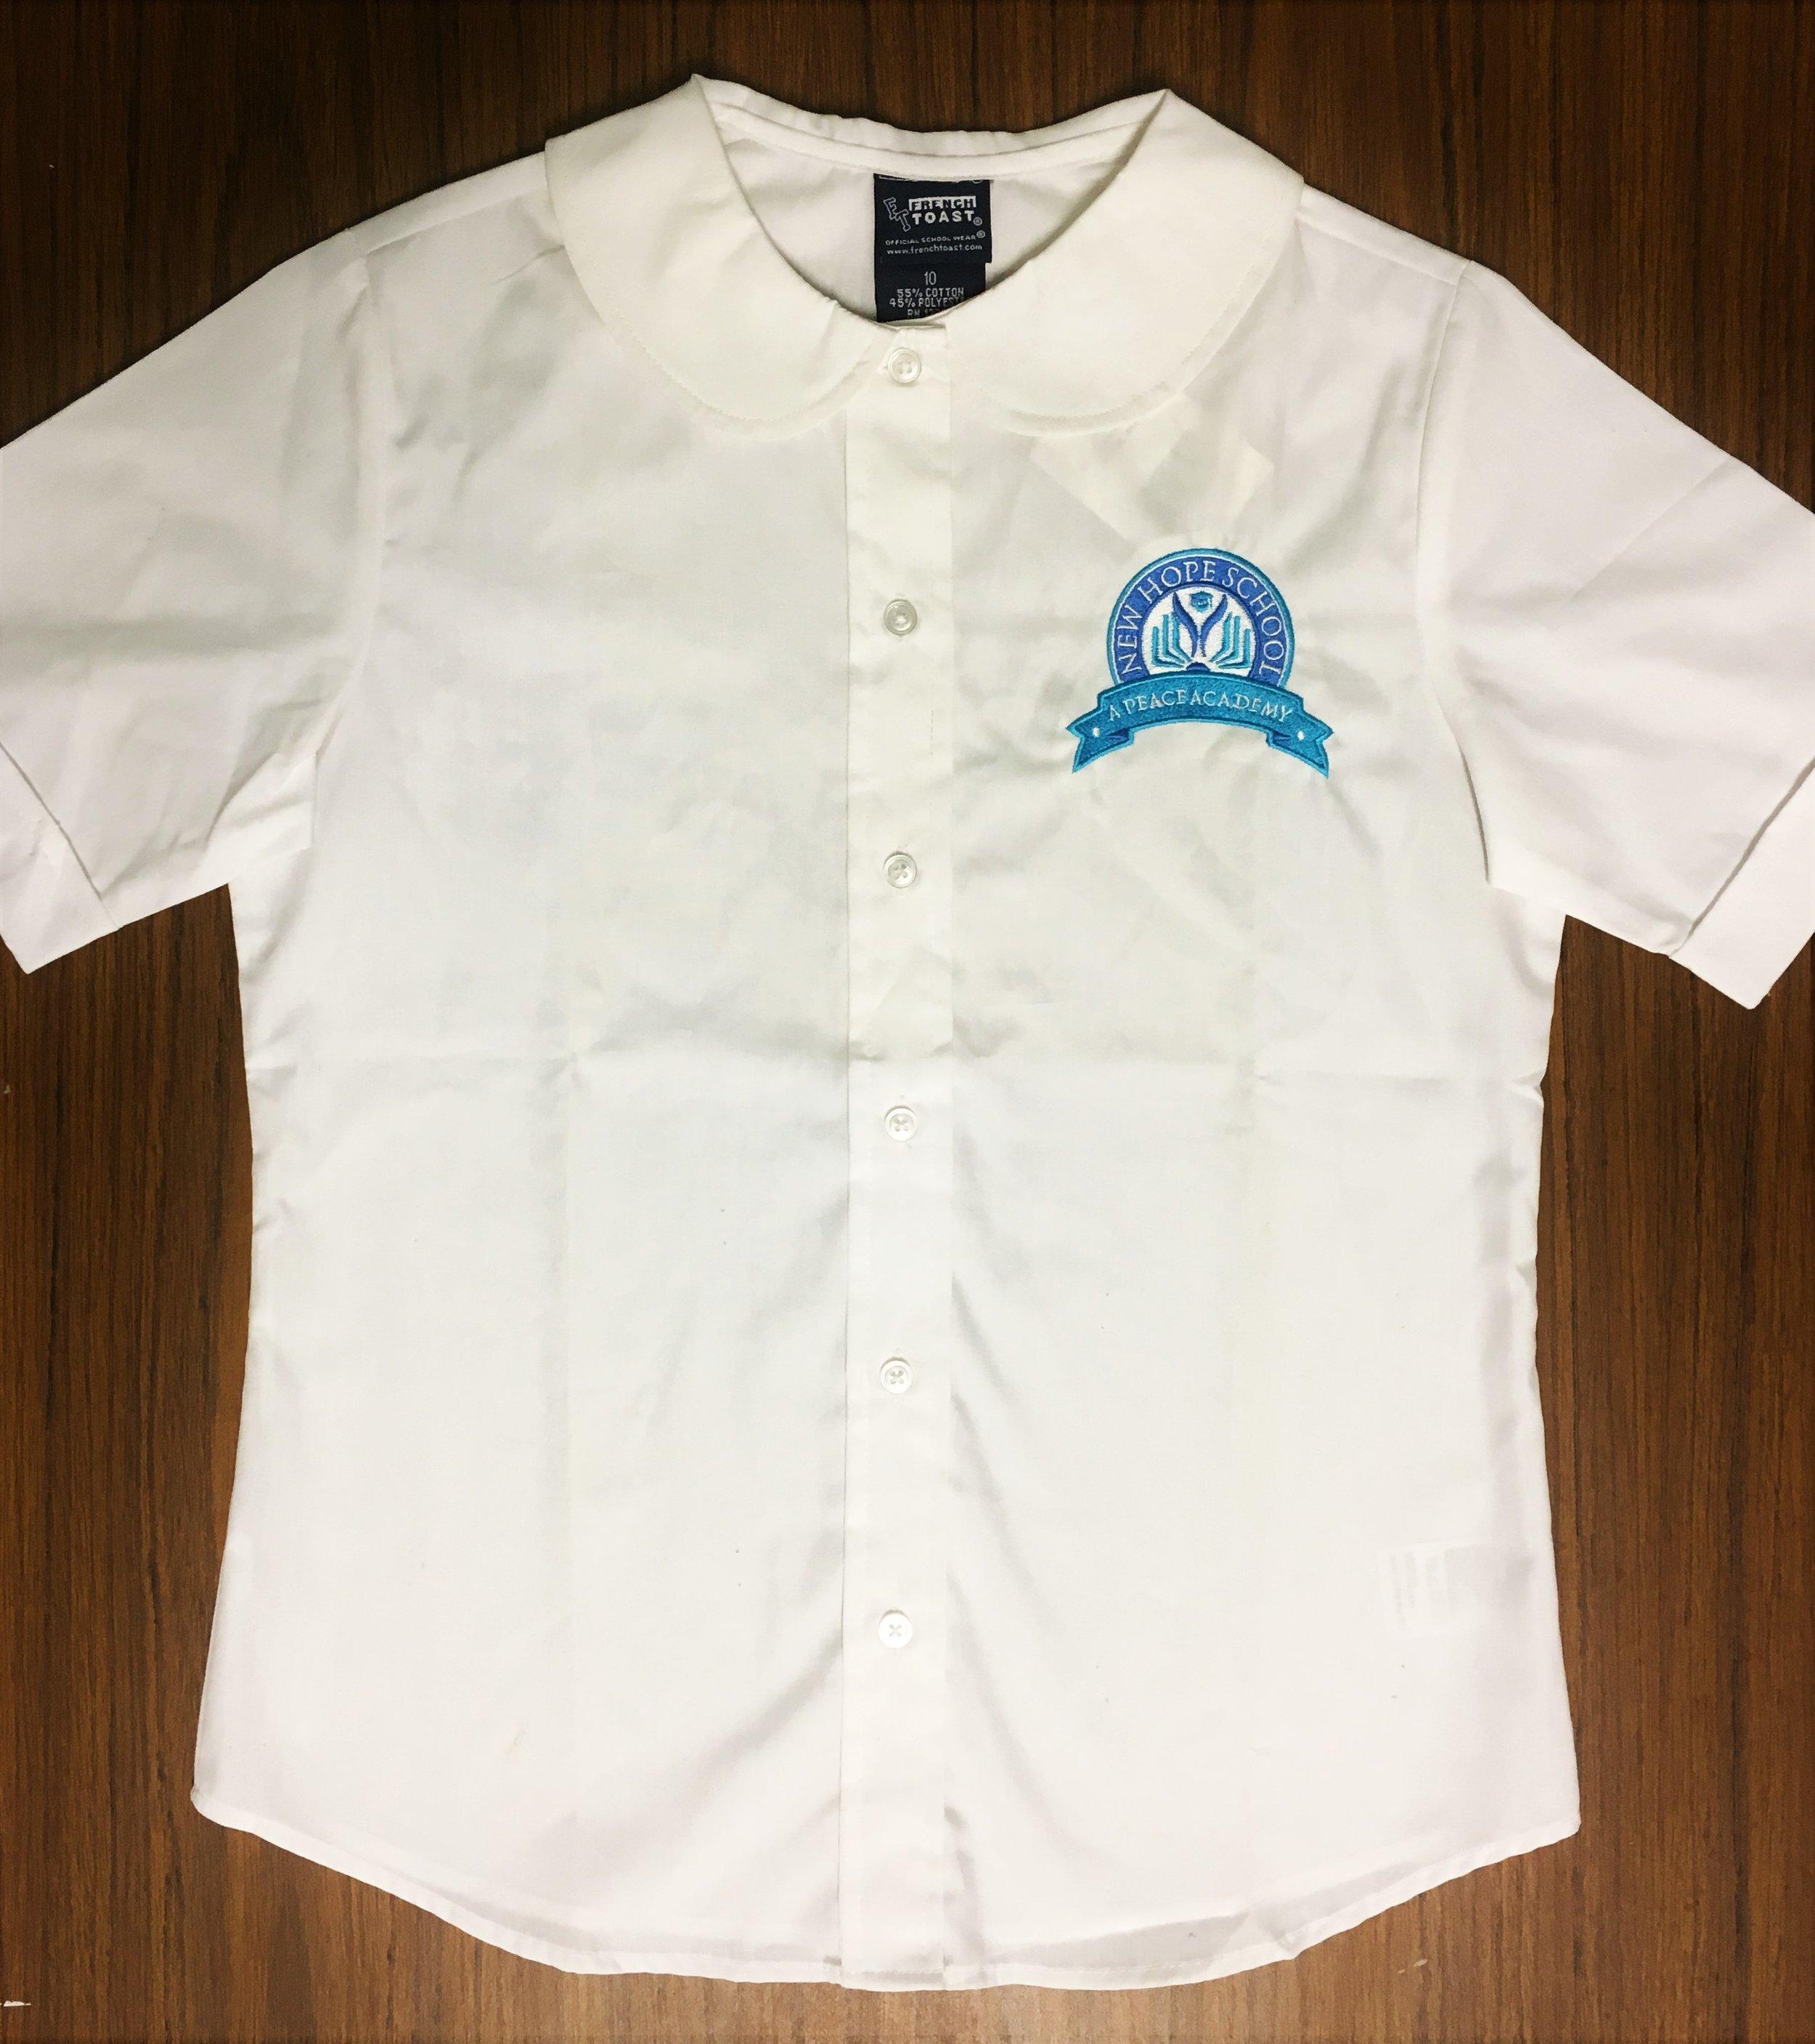 NHS-shirt.JPG